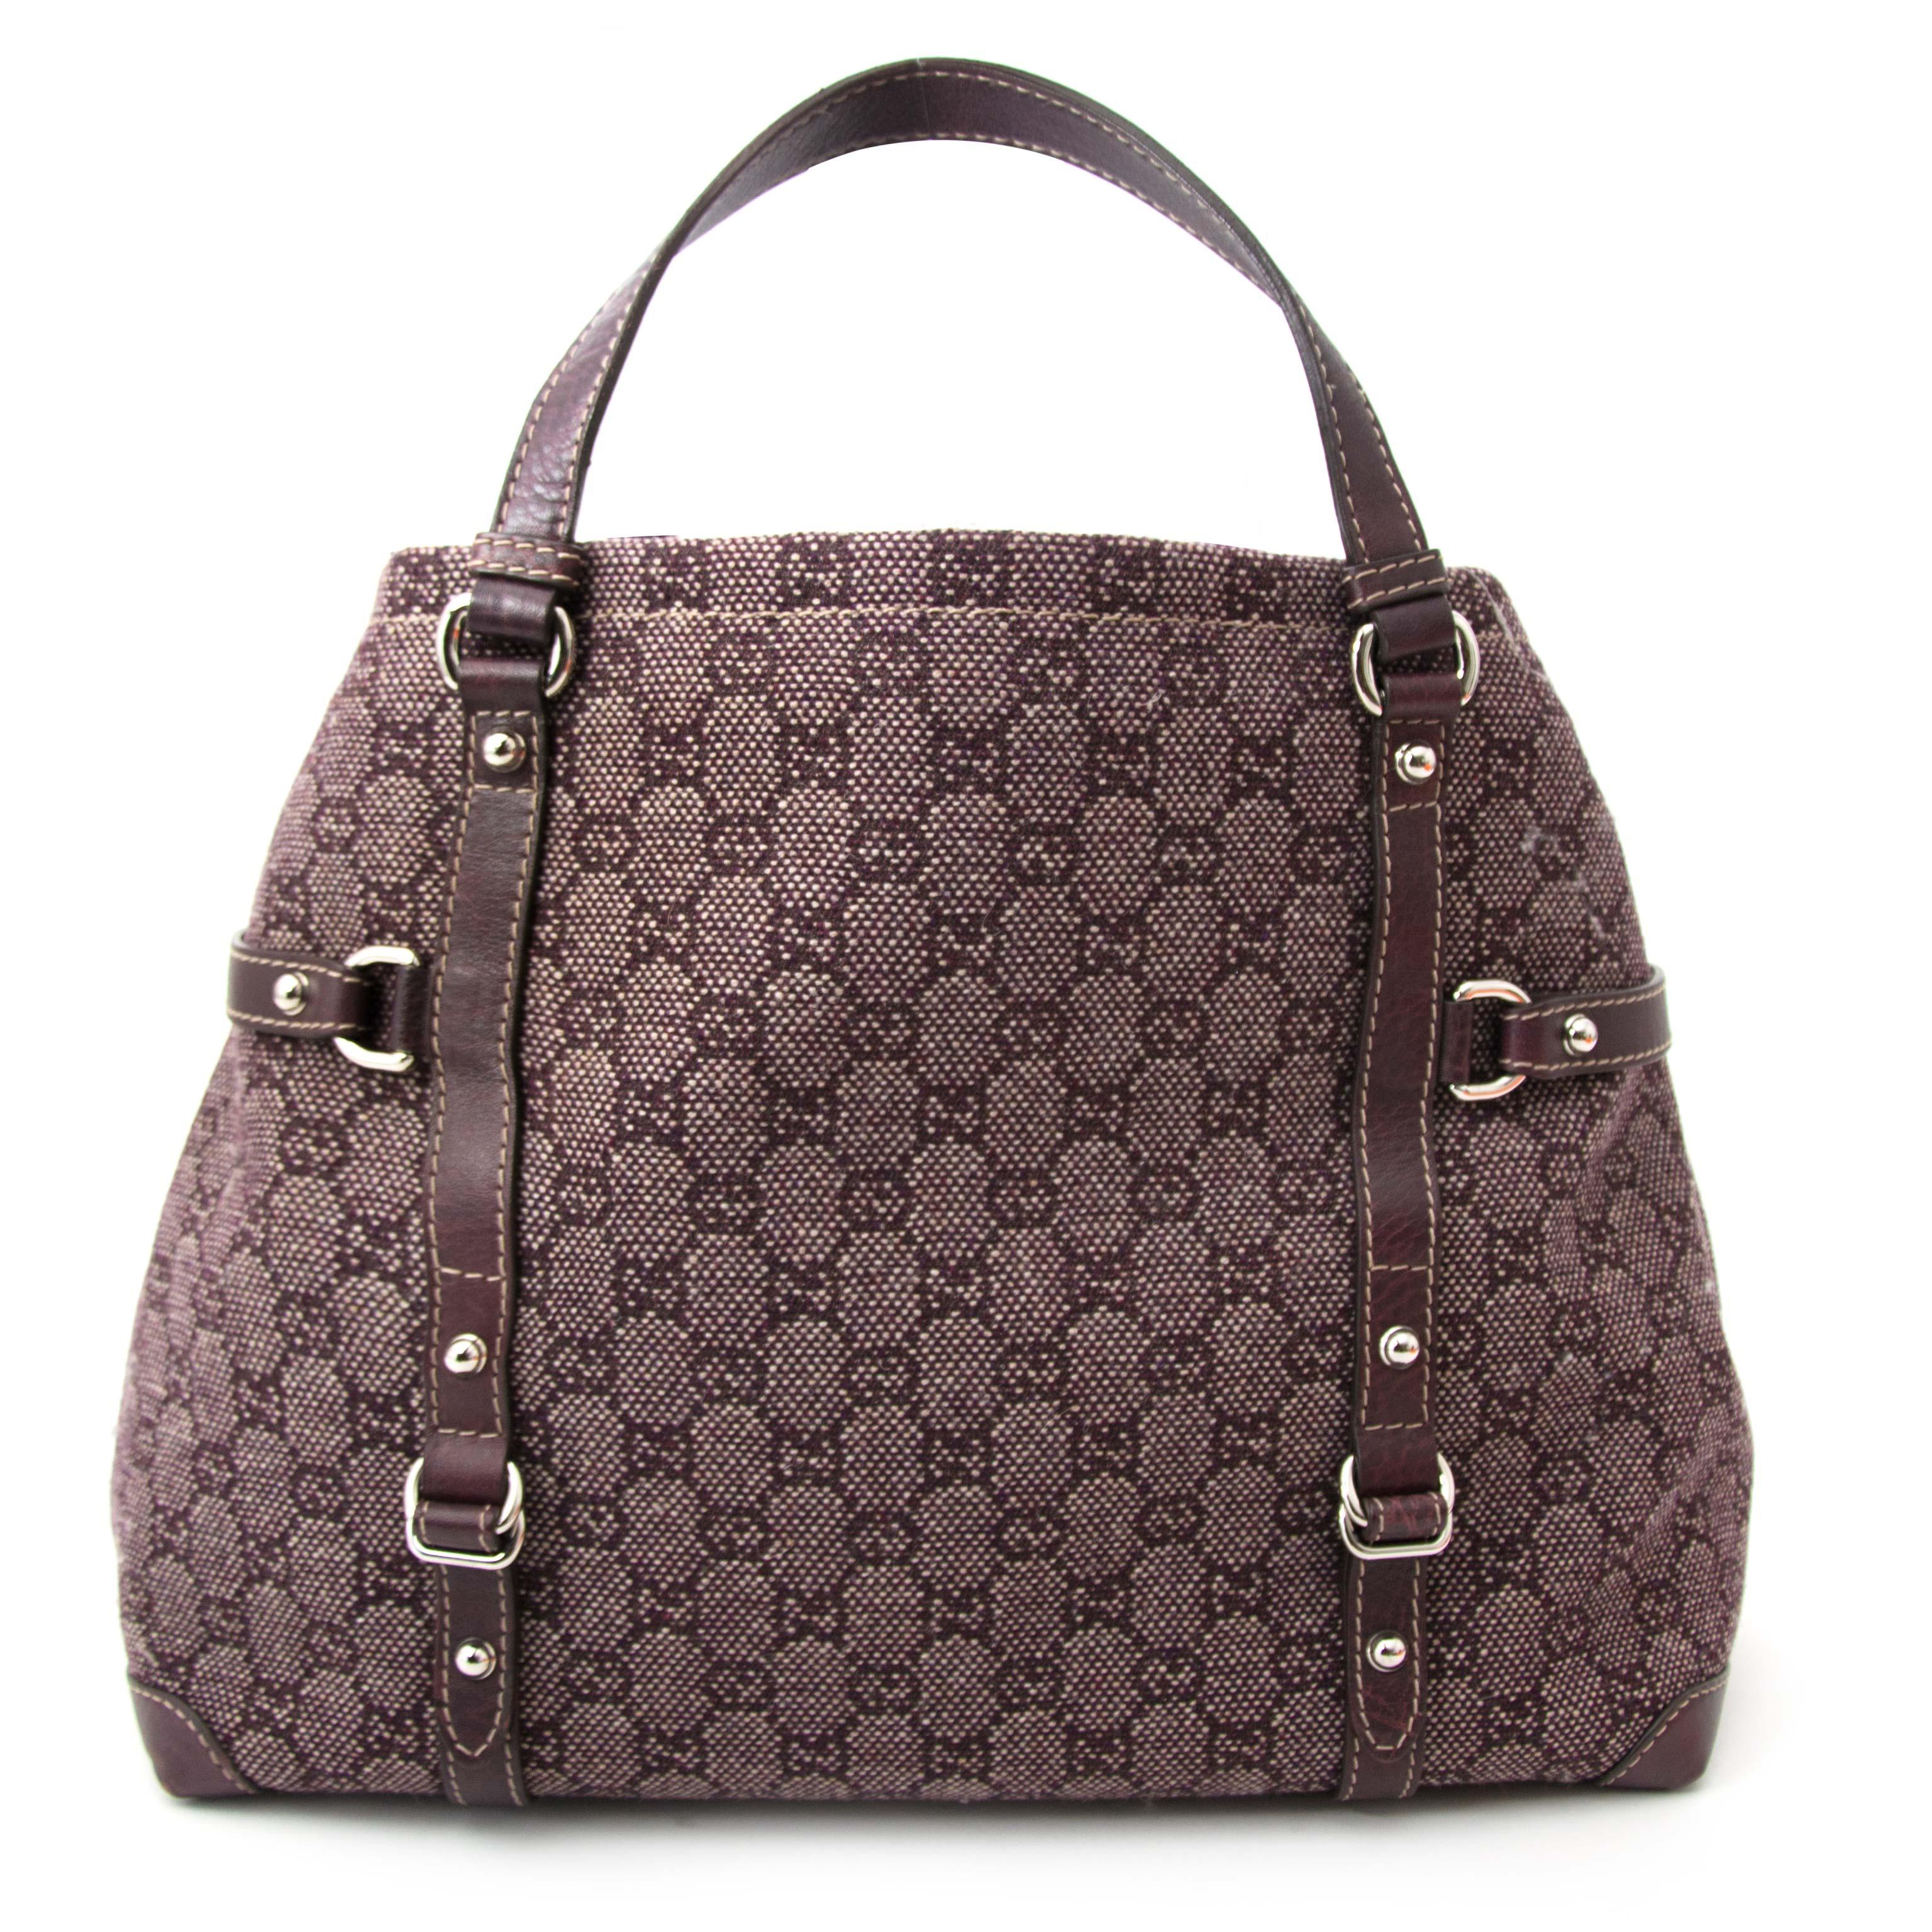 bb8e9f3e60a ... Acheter secur en ligne Gucci Monogram Tweed Monogram Plum Shopper